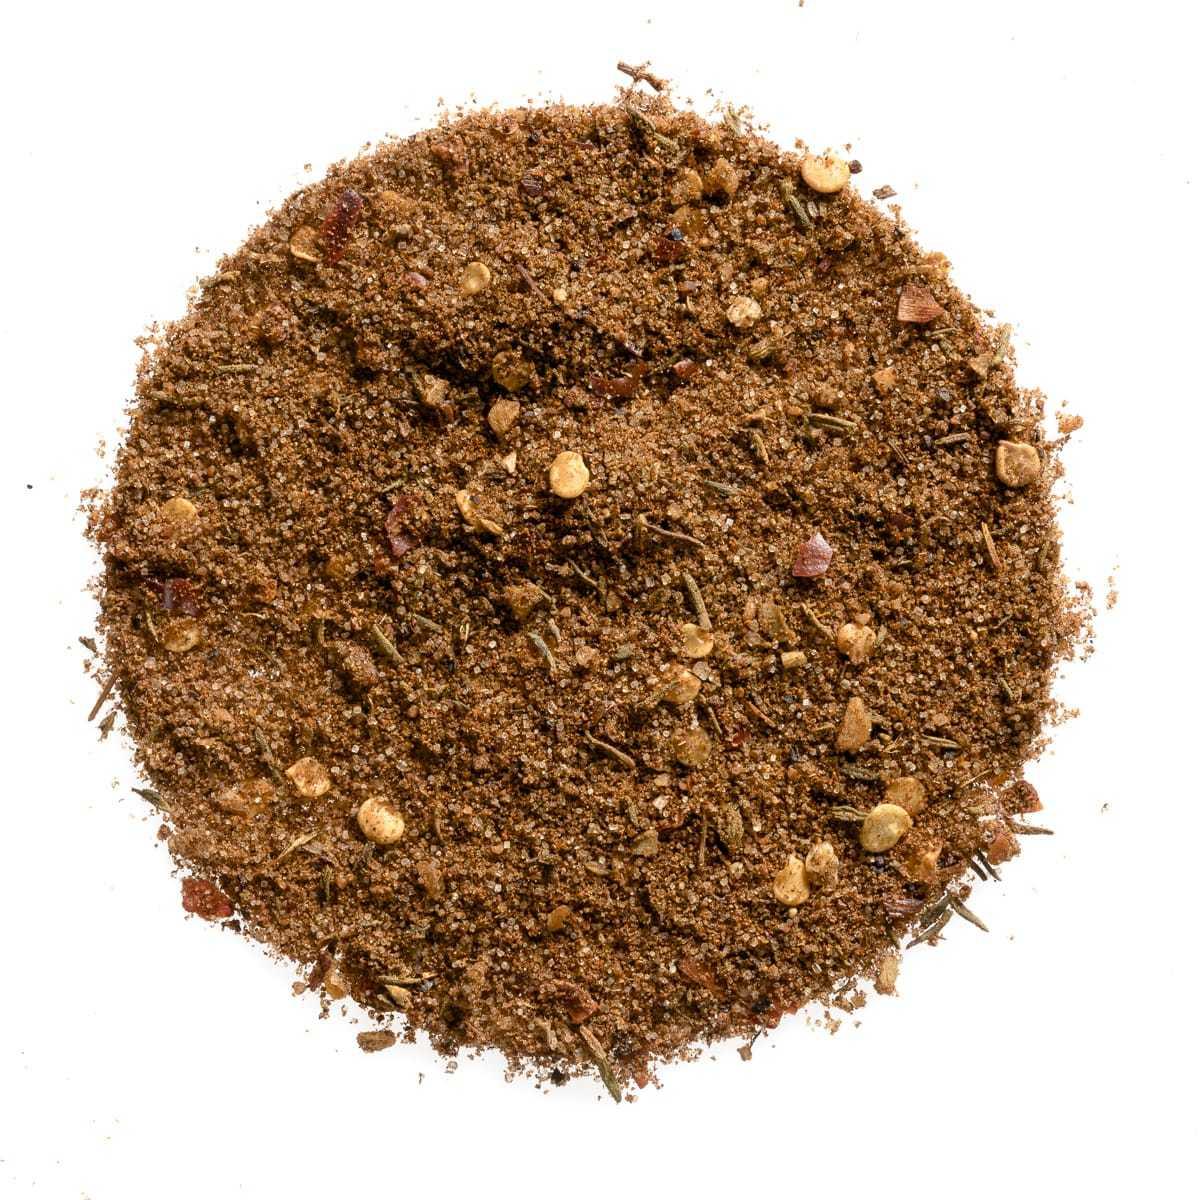 Creole Vs. Jerk Seasoning: PepperScale Showdown